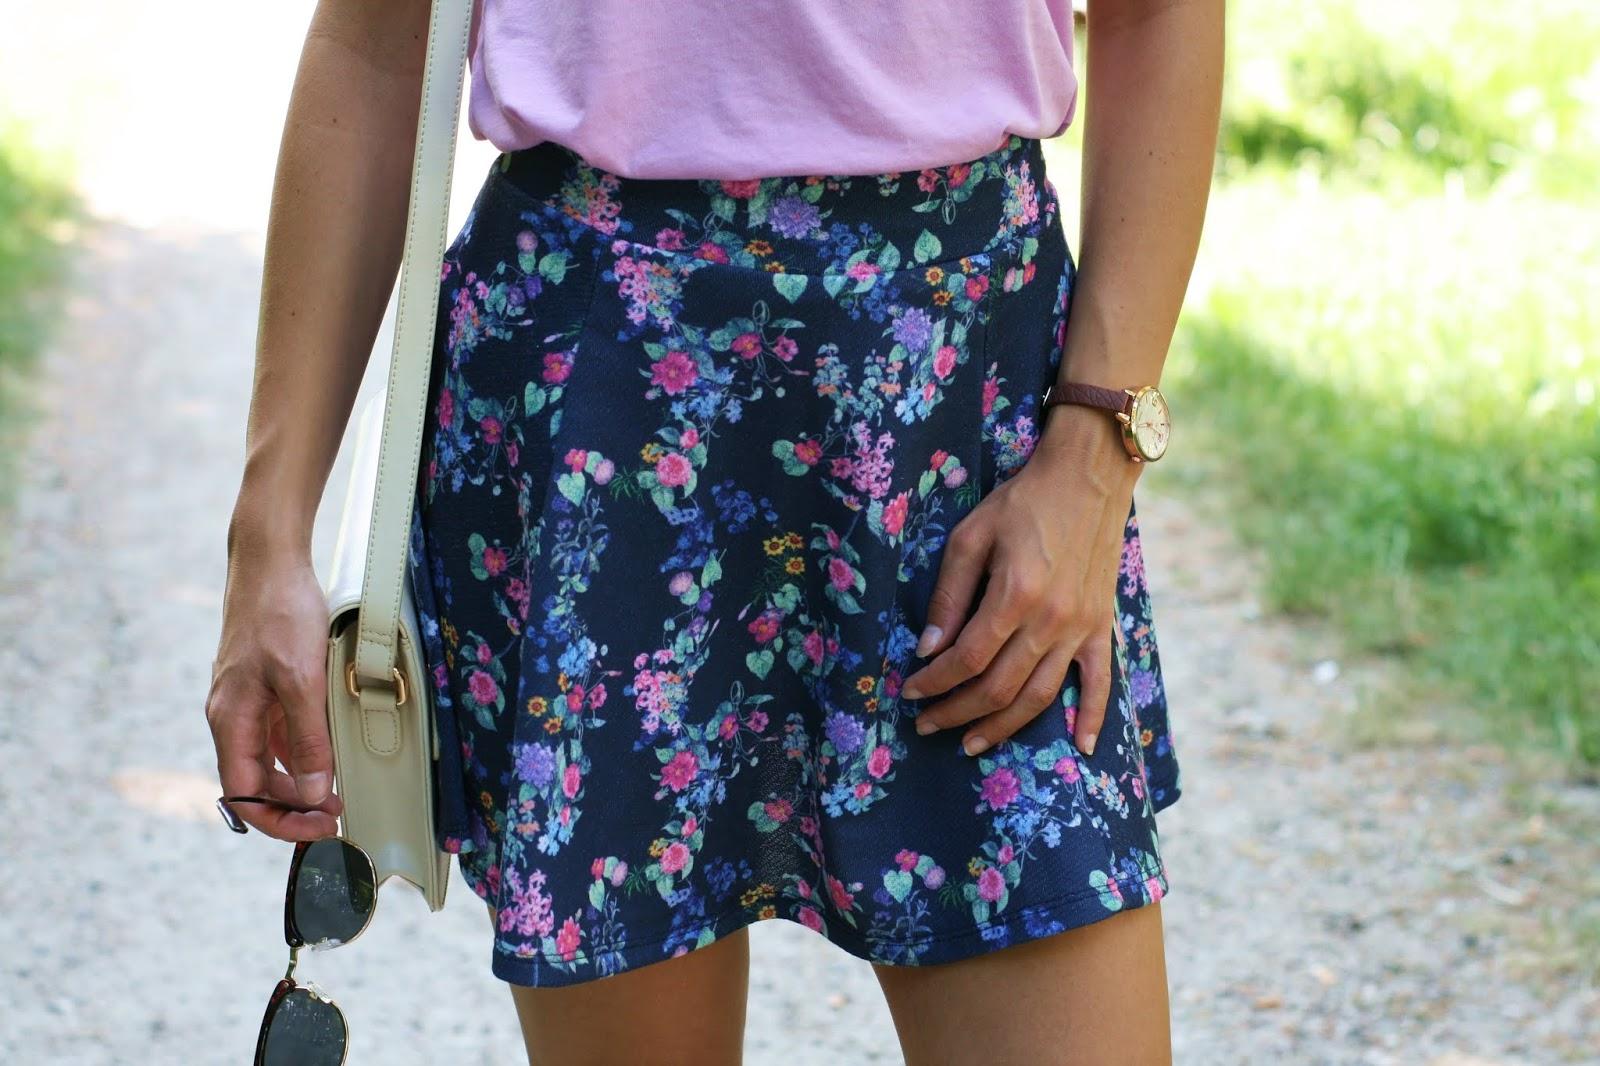 Spring in the city and skirt mood | Strój dnia z ulubioną spódnicą